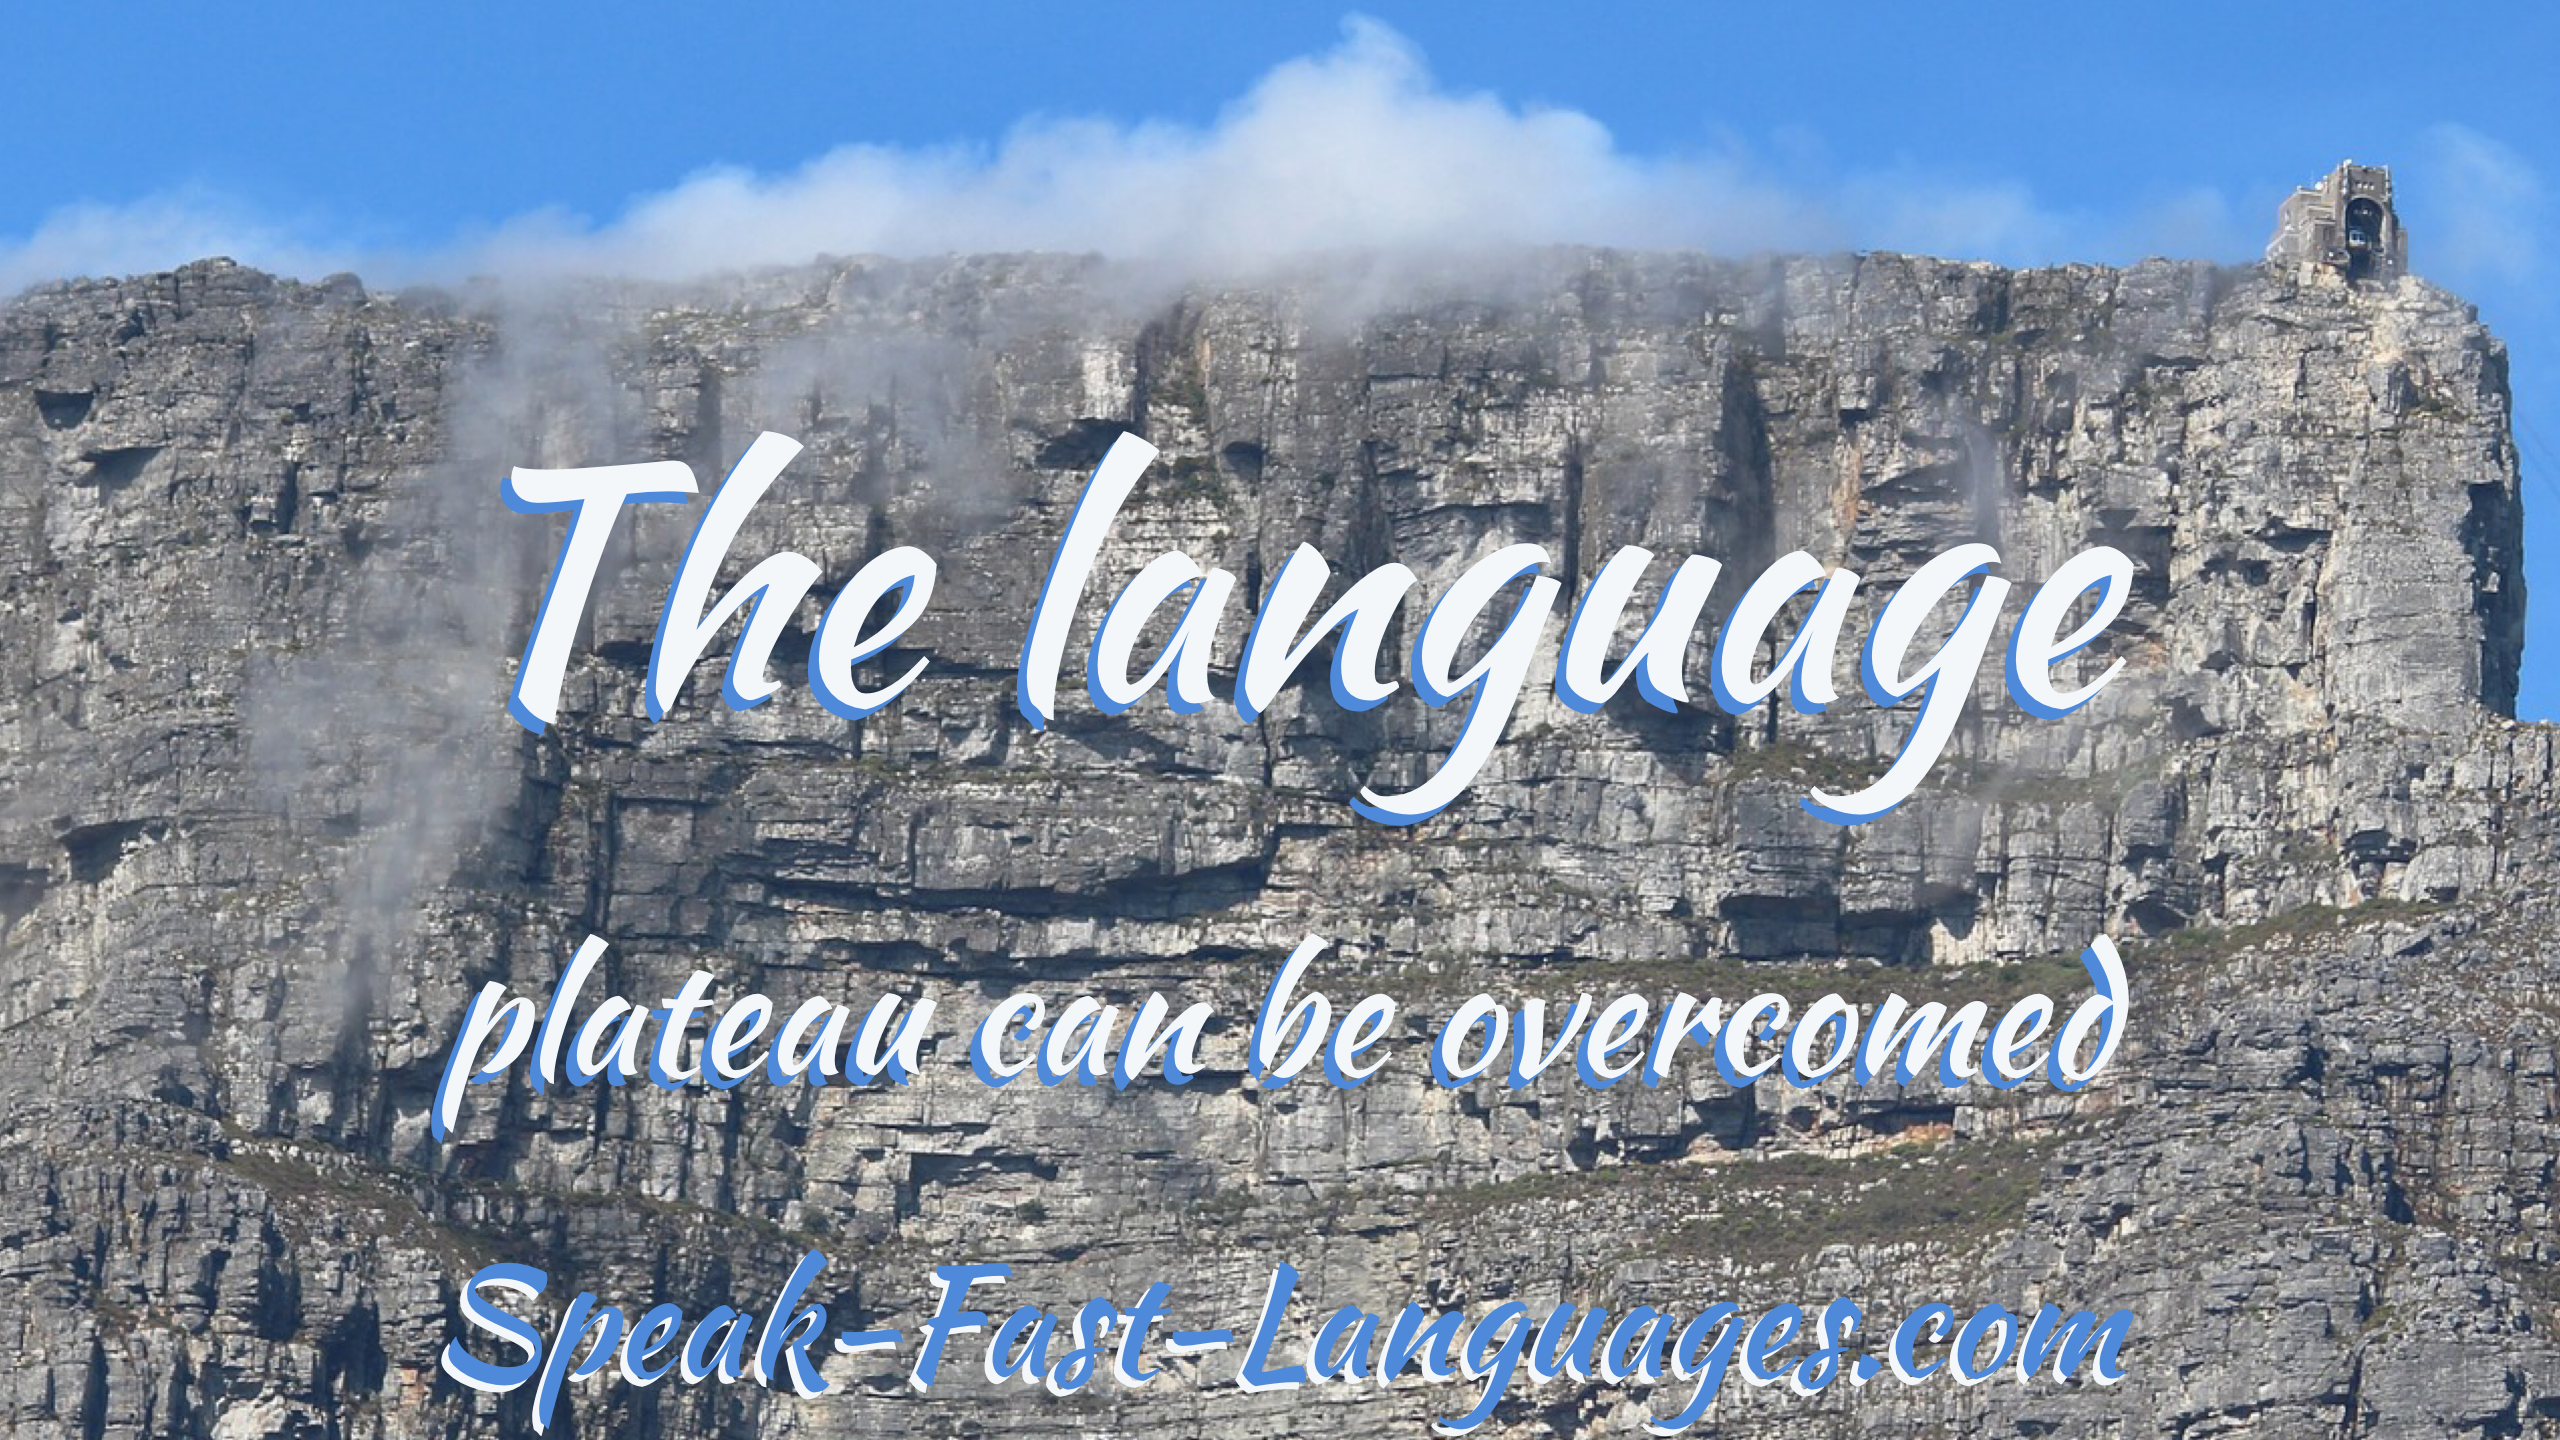 The Language Plateau Overcomed